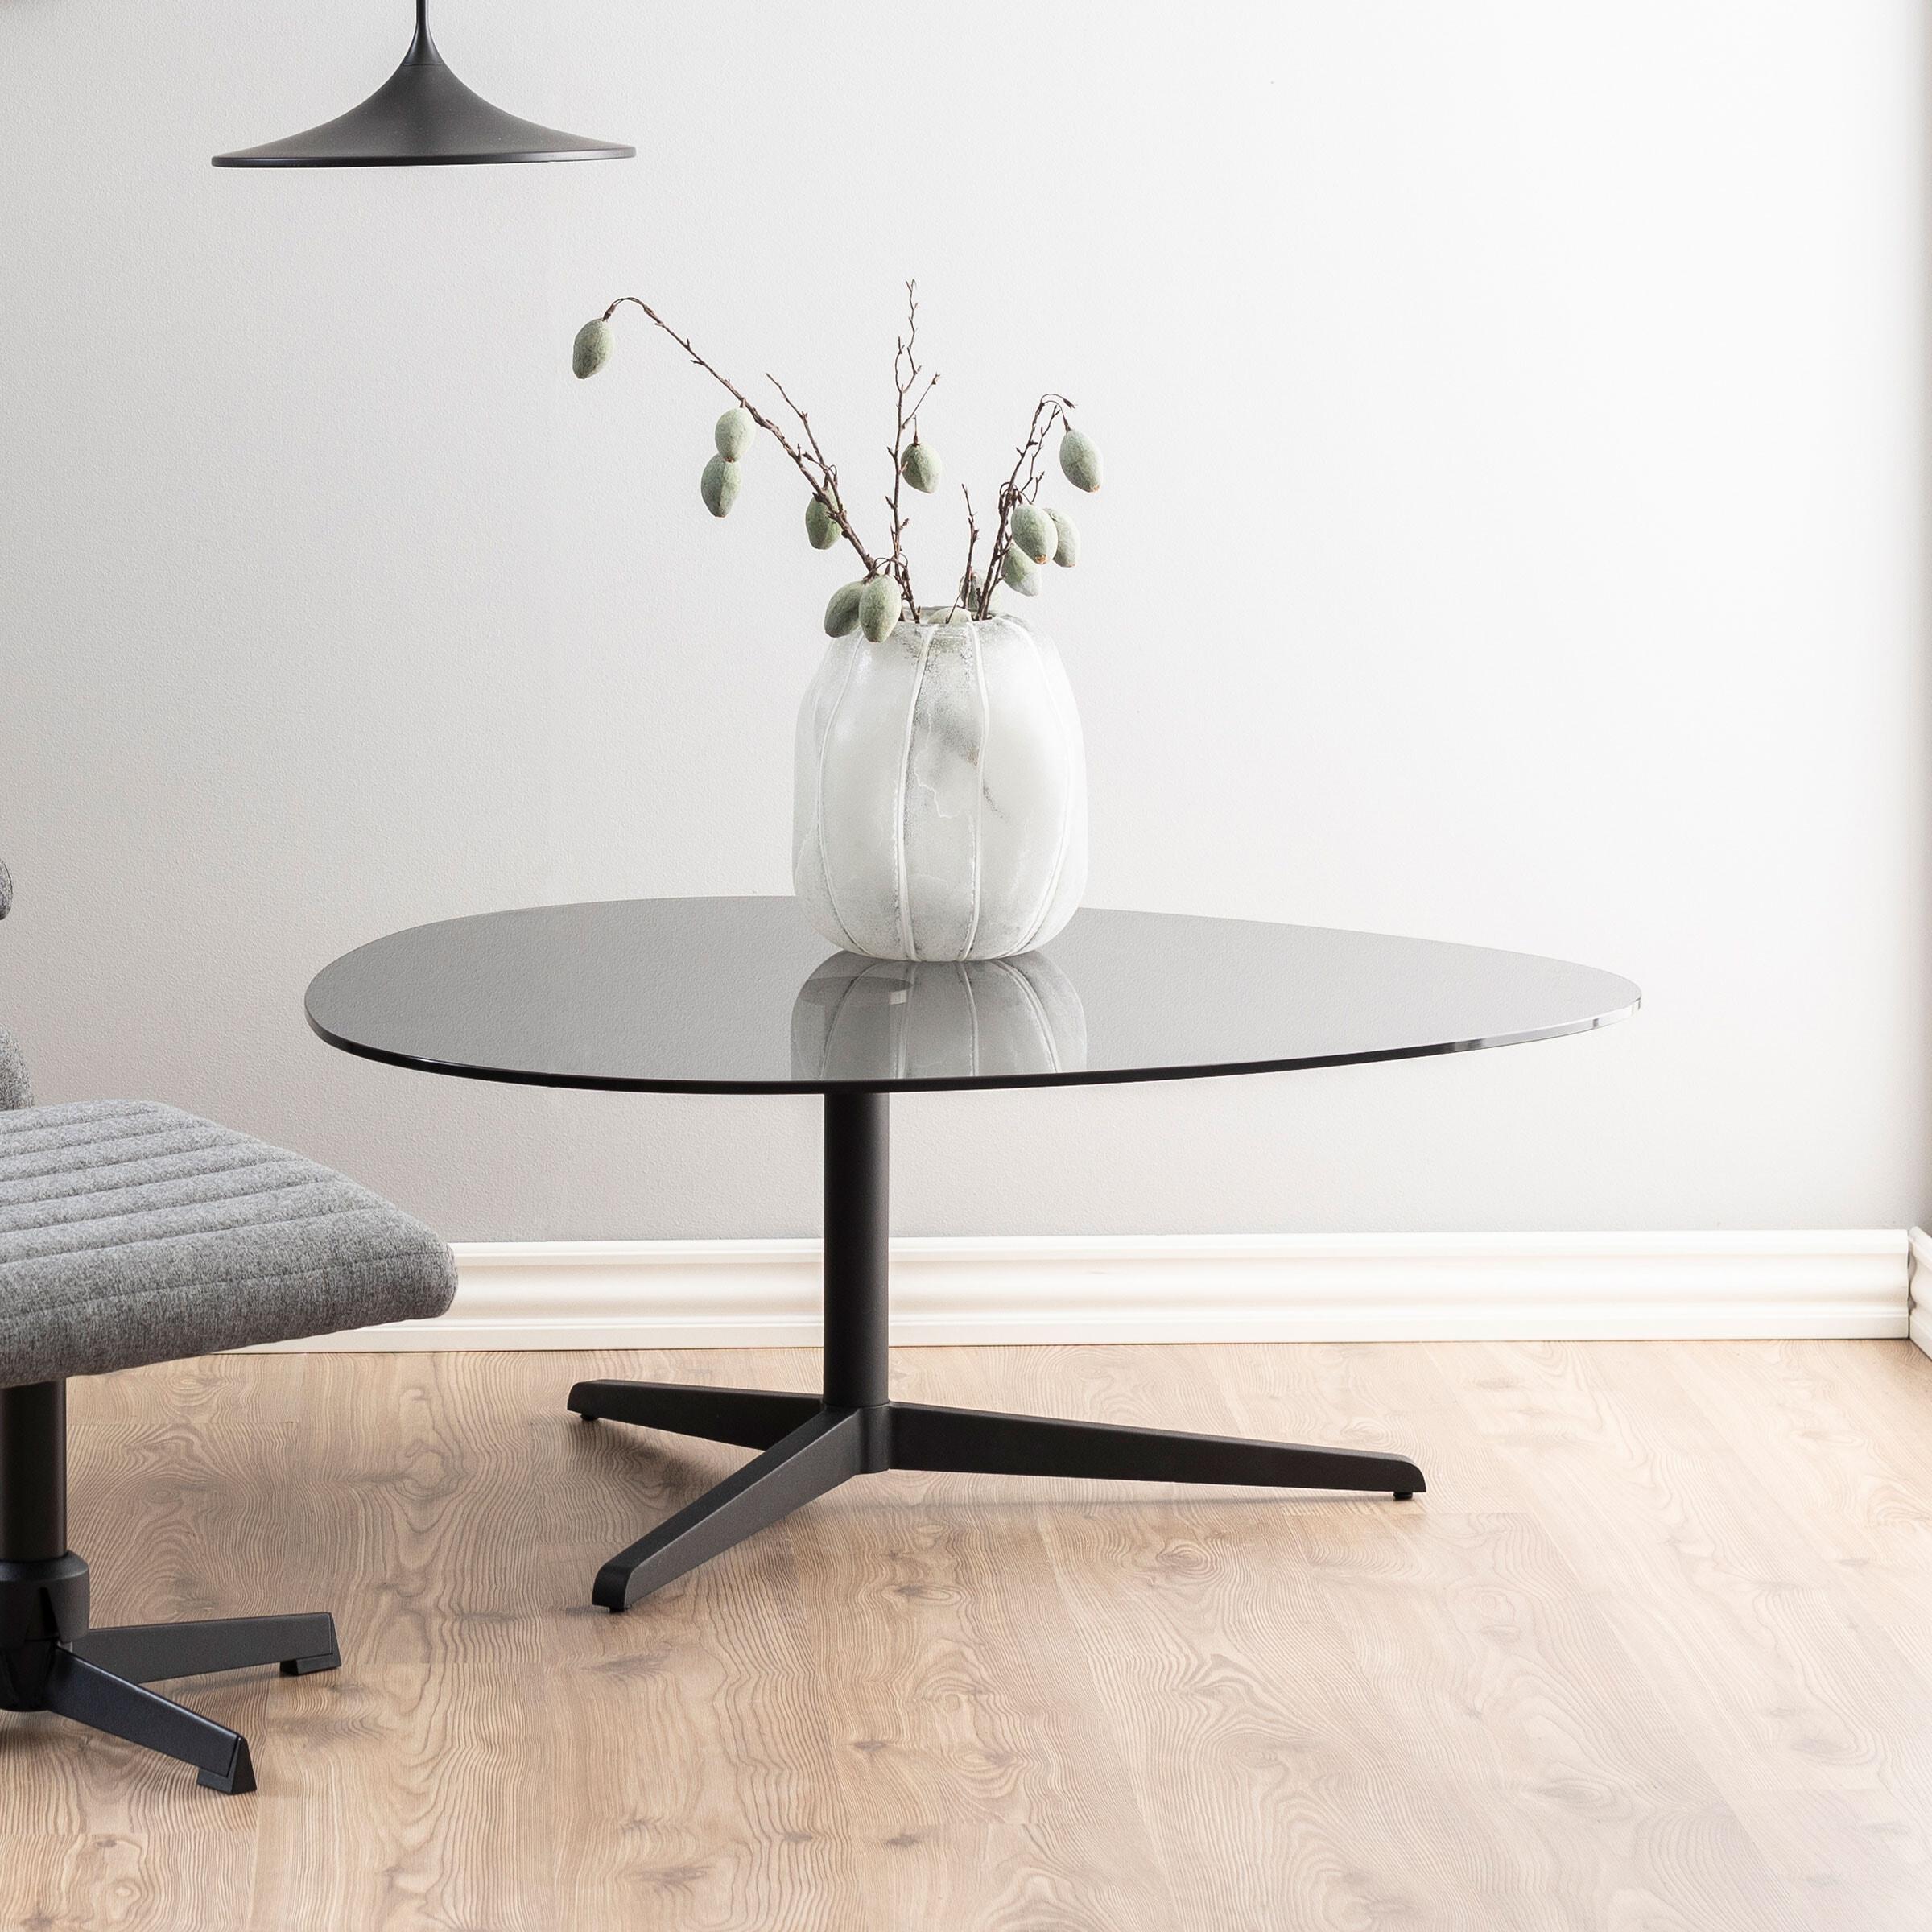 Bendt Glazen Salontafel 'Stephanie' 103 x 95cm, kleur zwart   Bendt